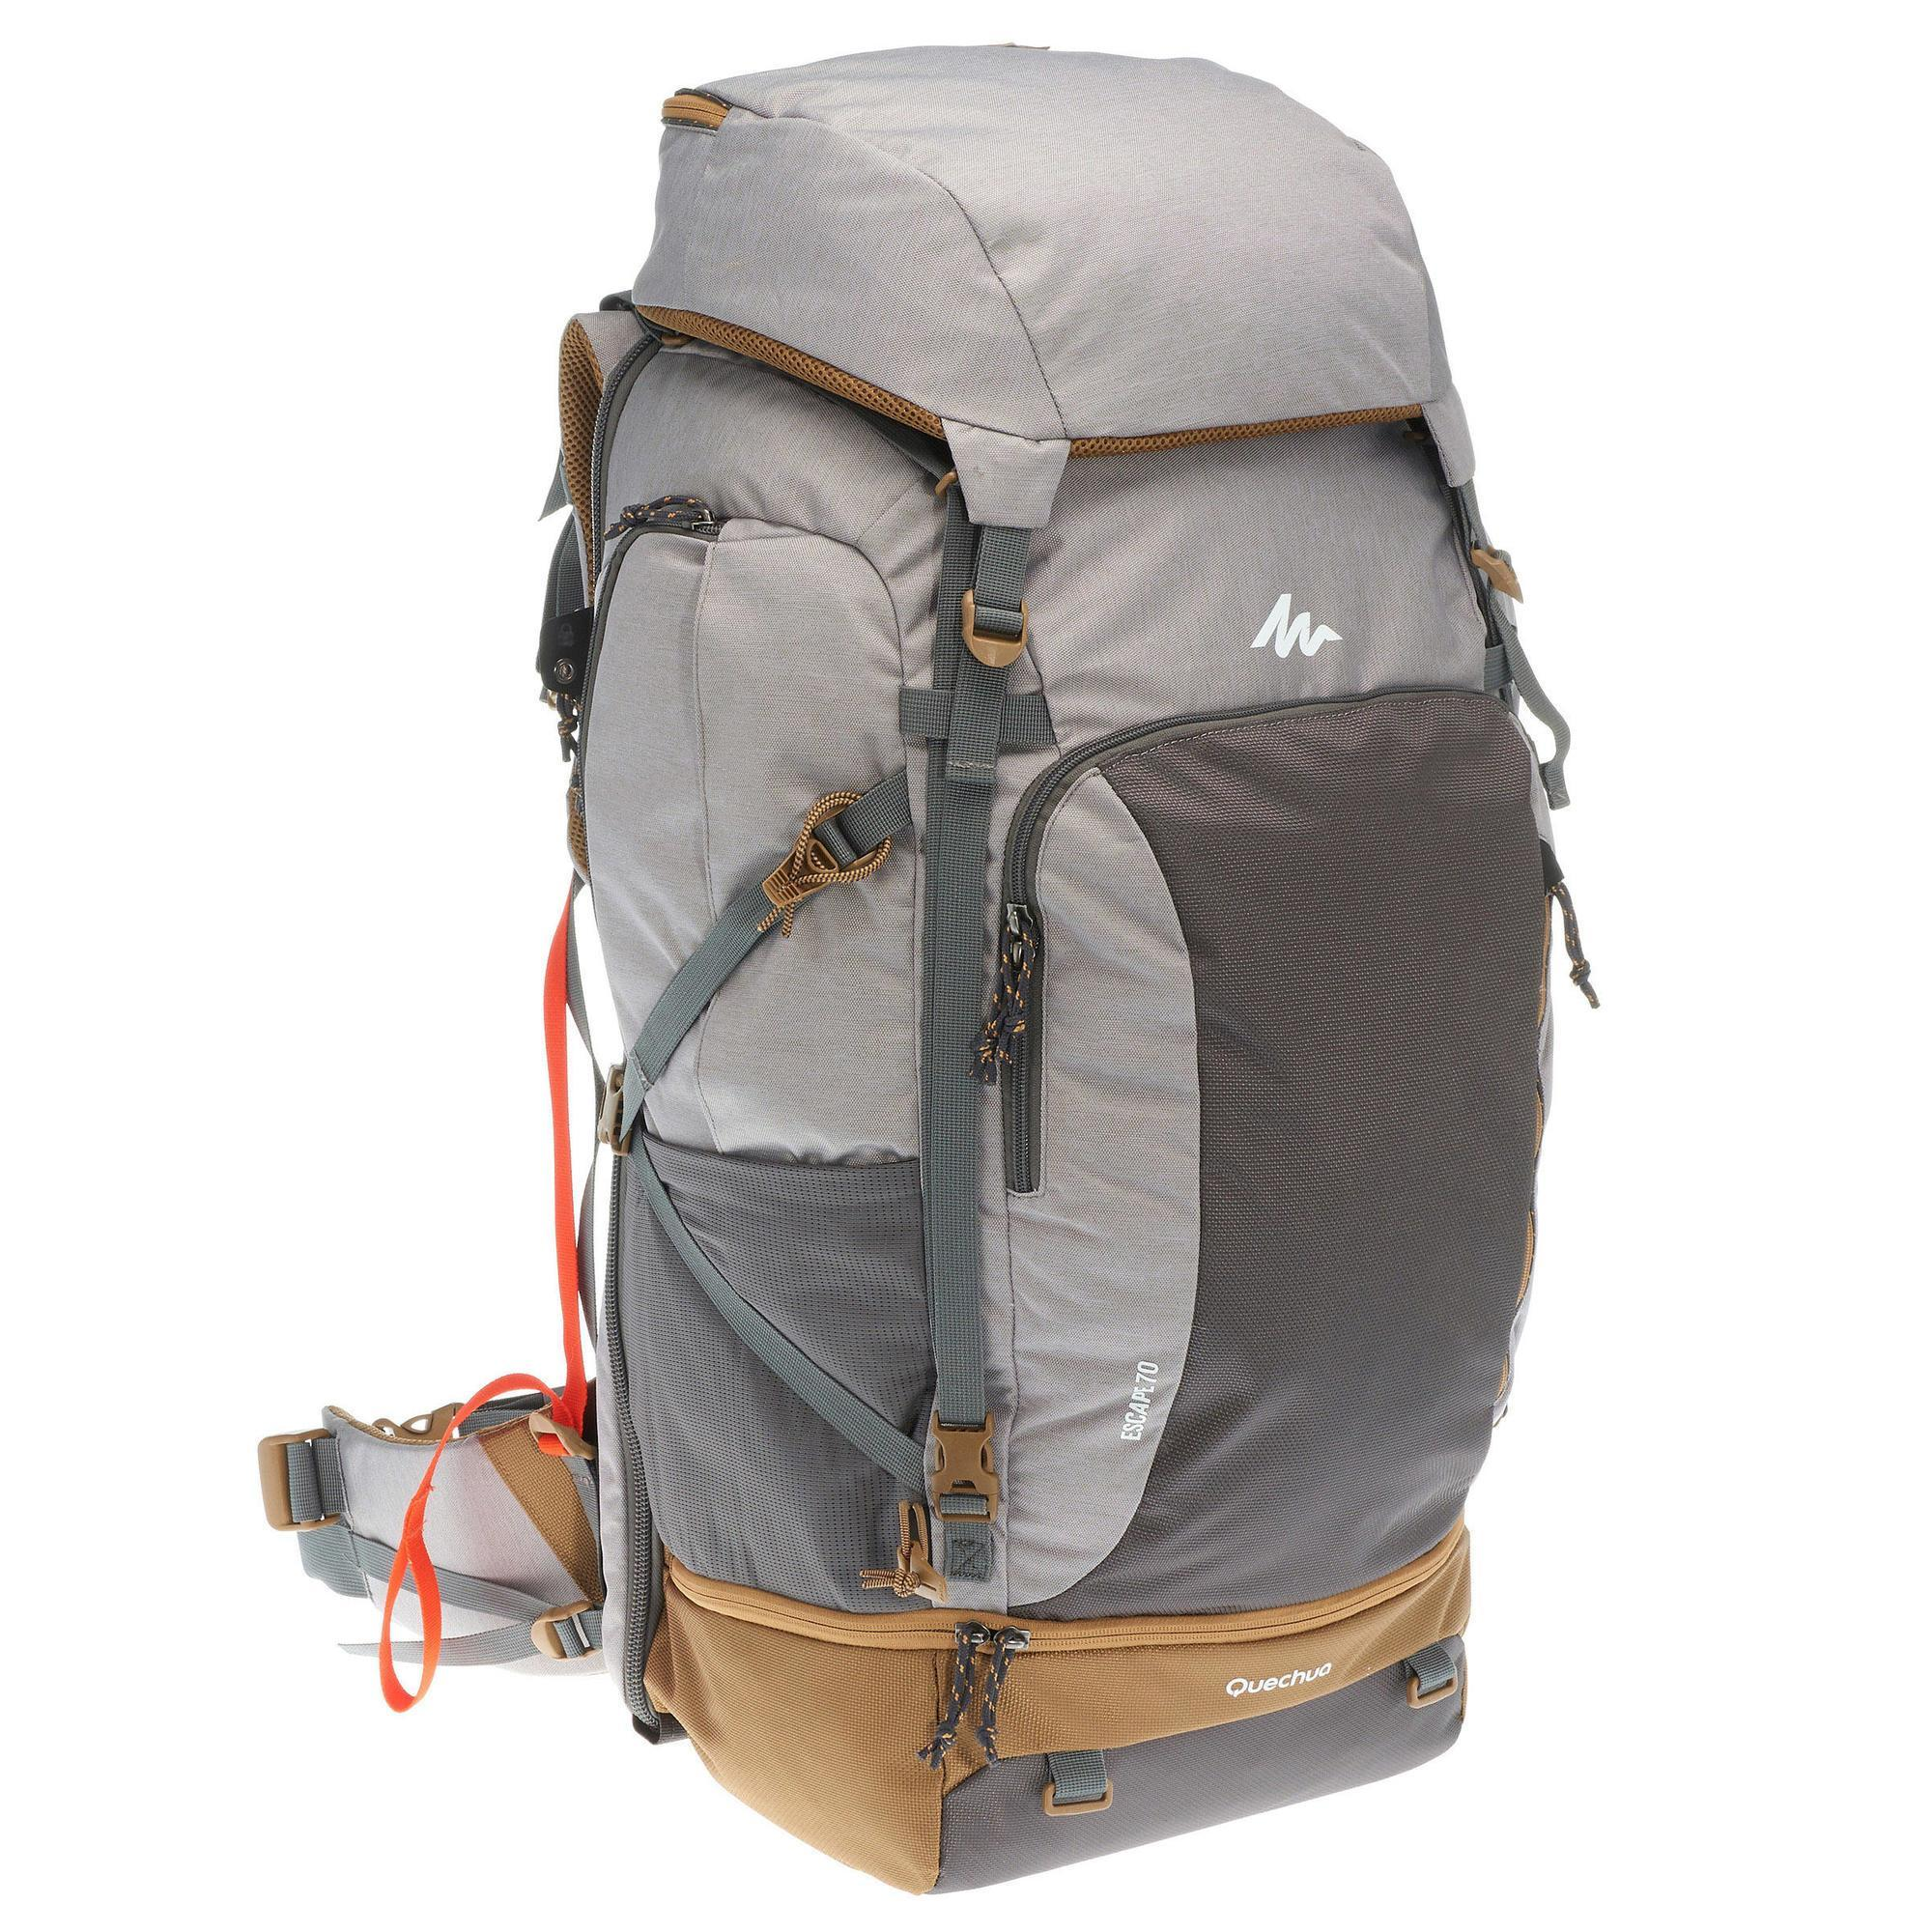 be99982c3 Mochila de Montaña y Trekking Forclaz Travel500 70 Litros Mujer Gris  Forclaz